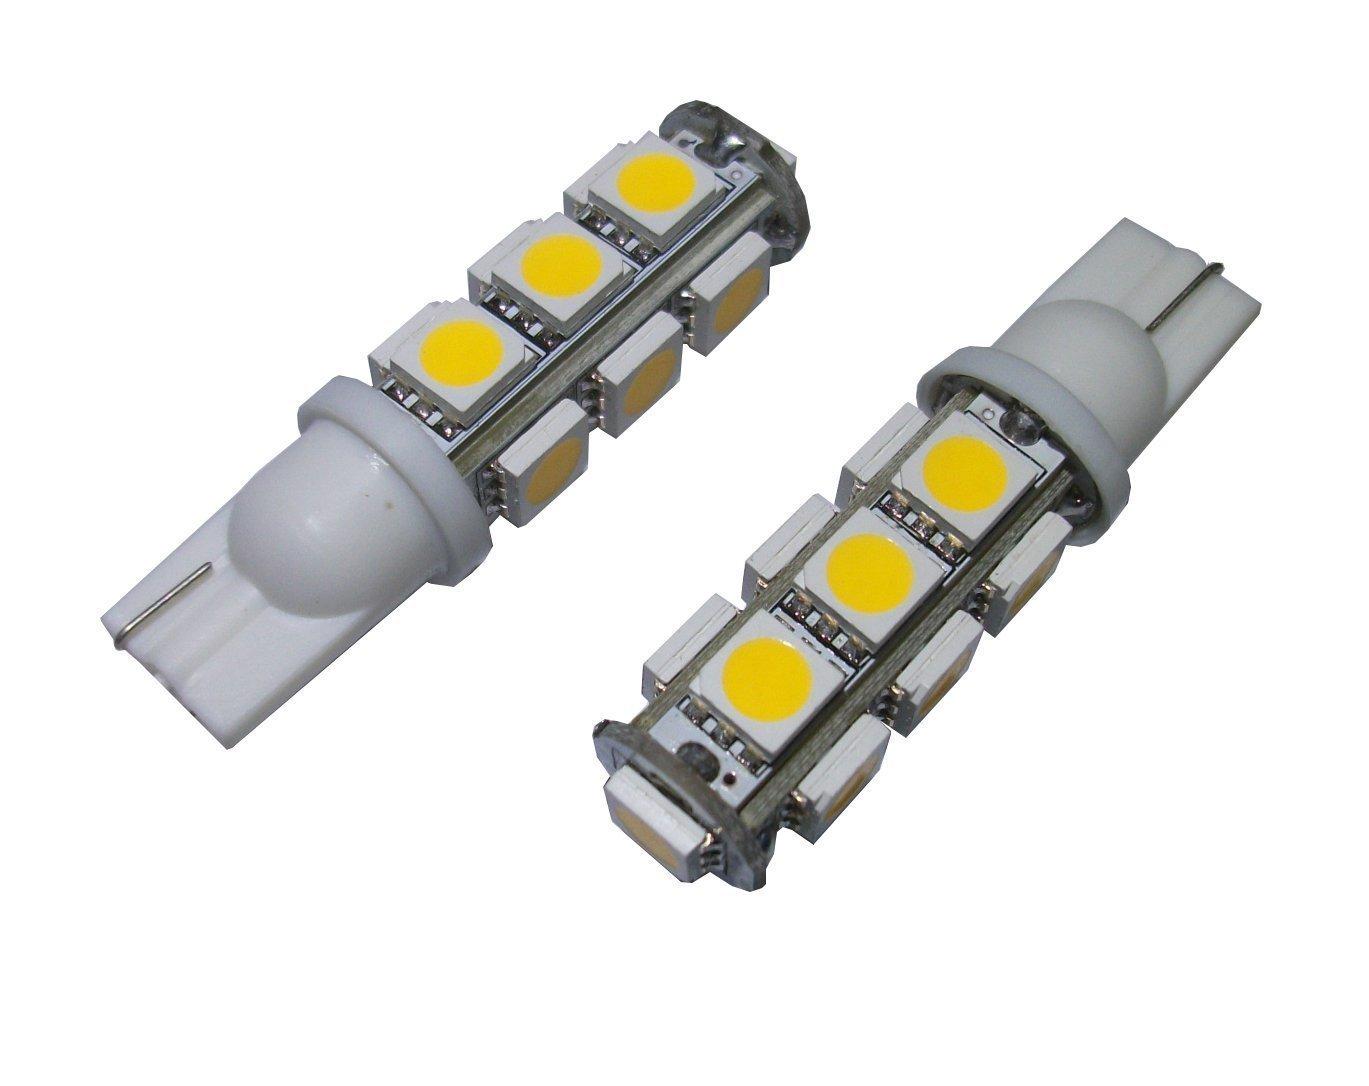 13-SMD Parking light,Side marker and Backup lights Turn signal light Corner light T10 921 194 13-5050 SMD Wedge LED Bulb lamp Super Bright Warm White DC 12V,Wedge LED Bulb For Tail lights